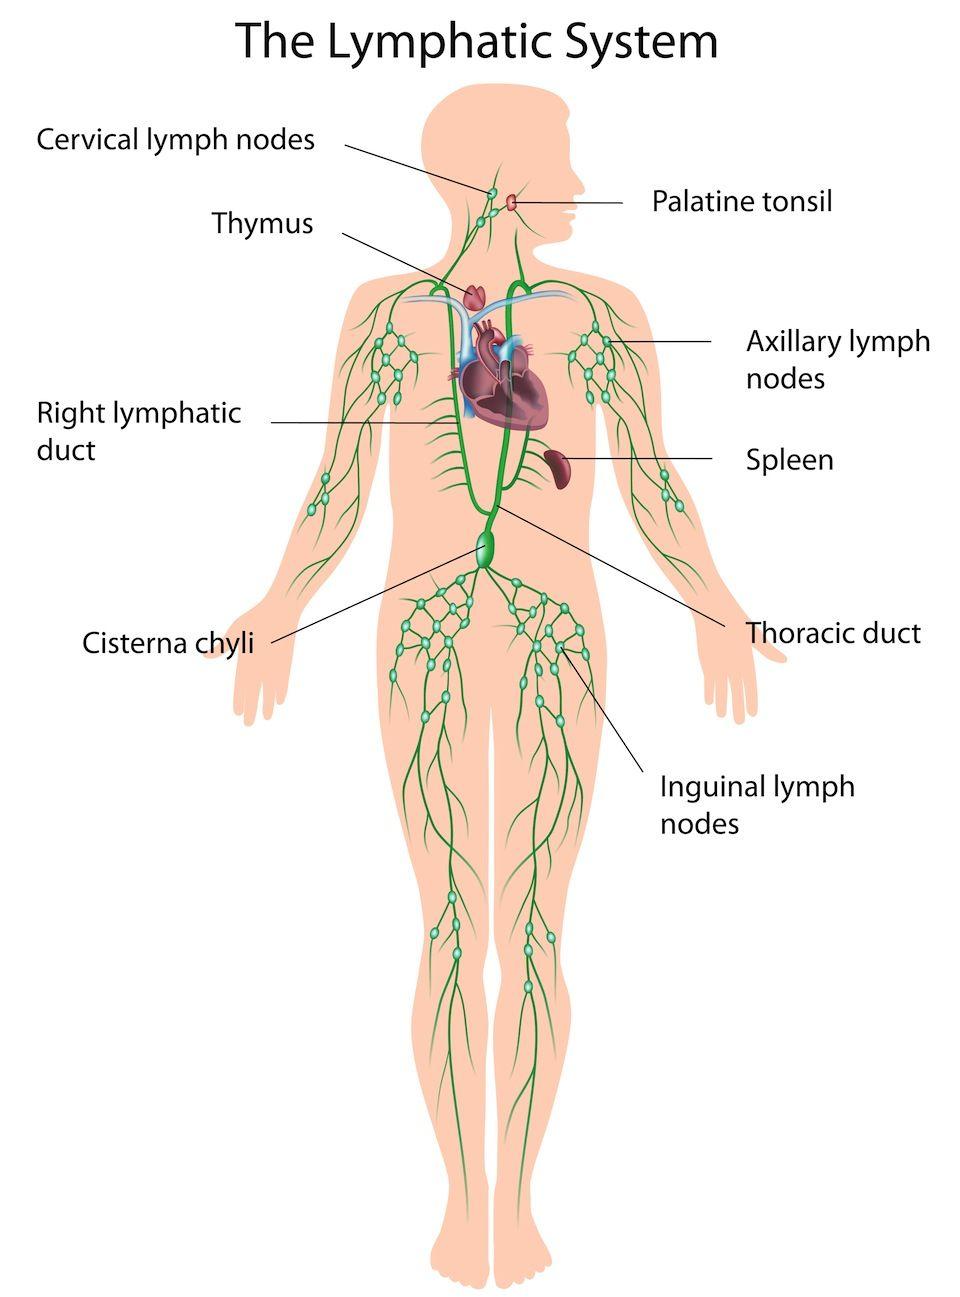 Female lymphatic system Female lymphatic system | CC3 Classical Homeschooling for Abecedarians